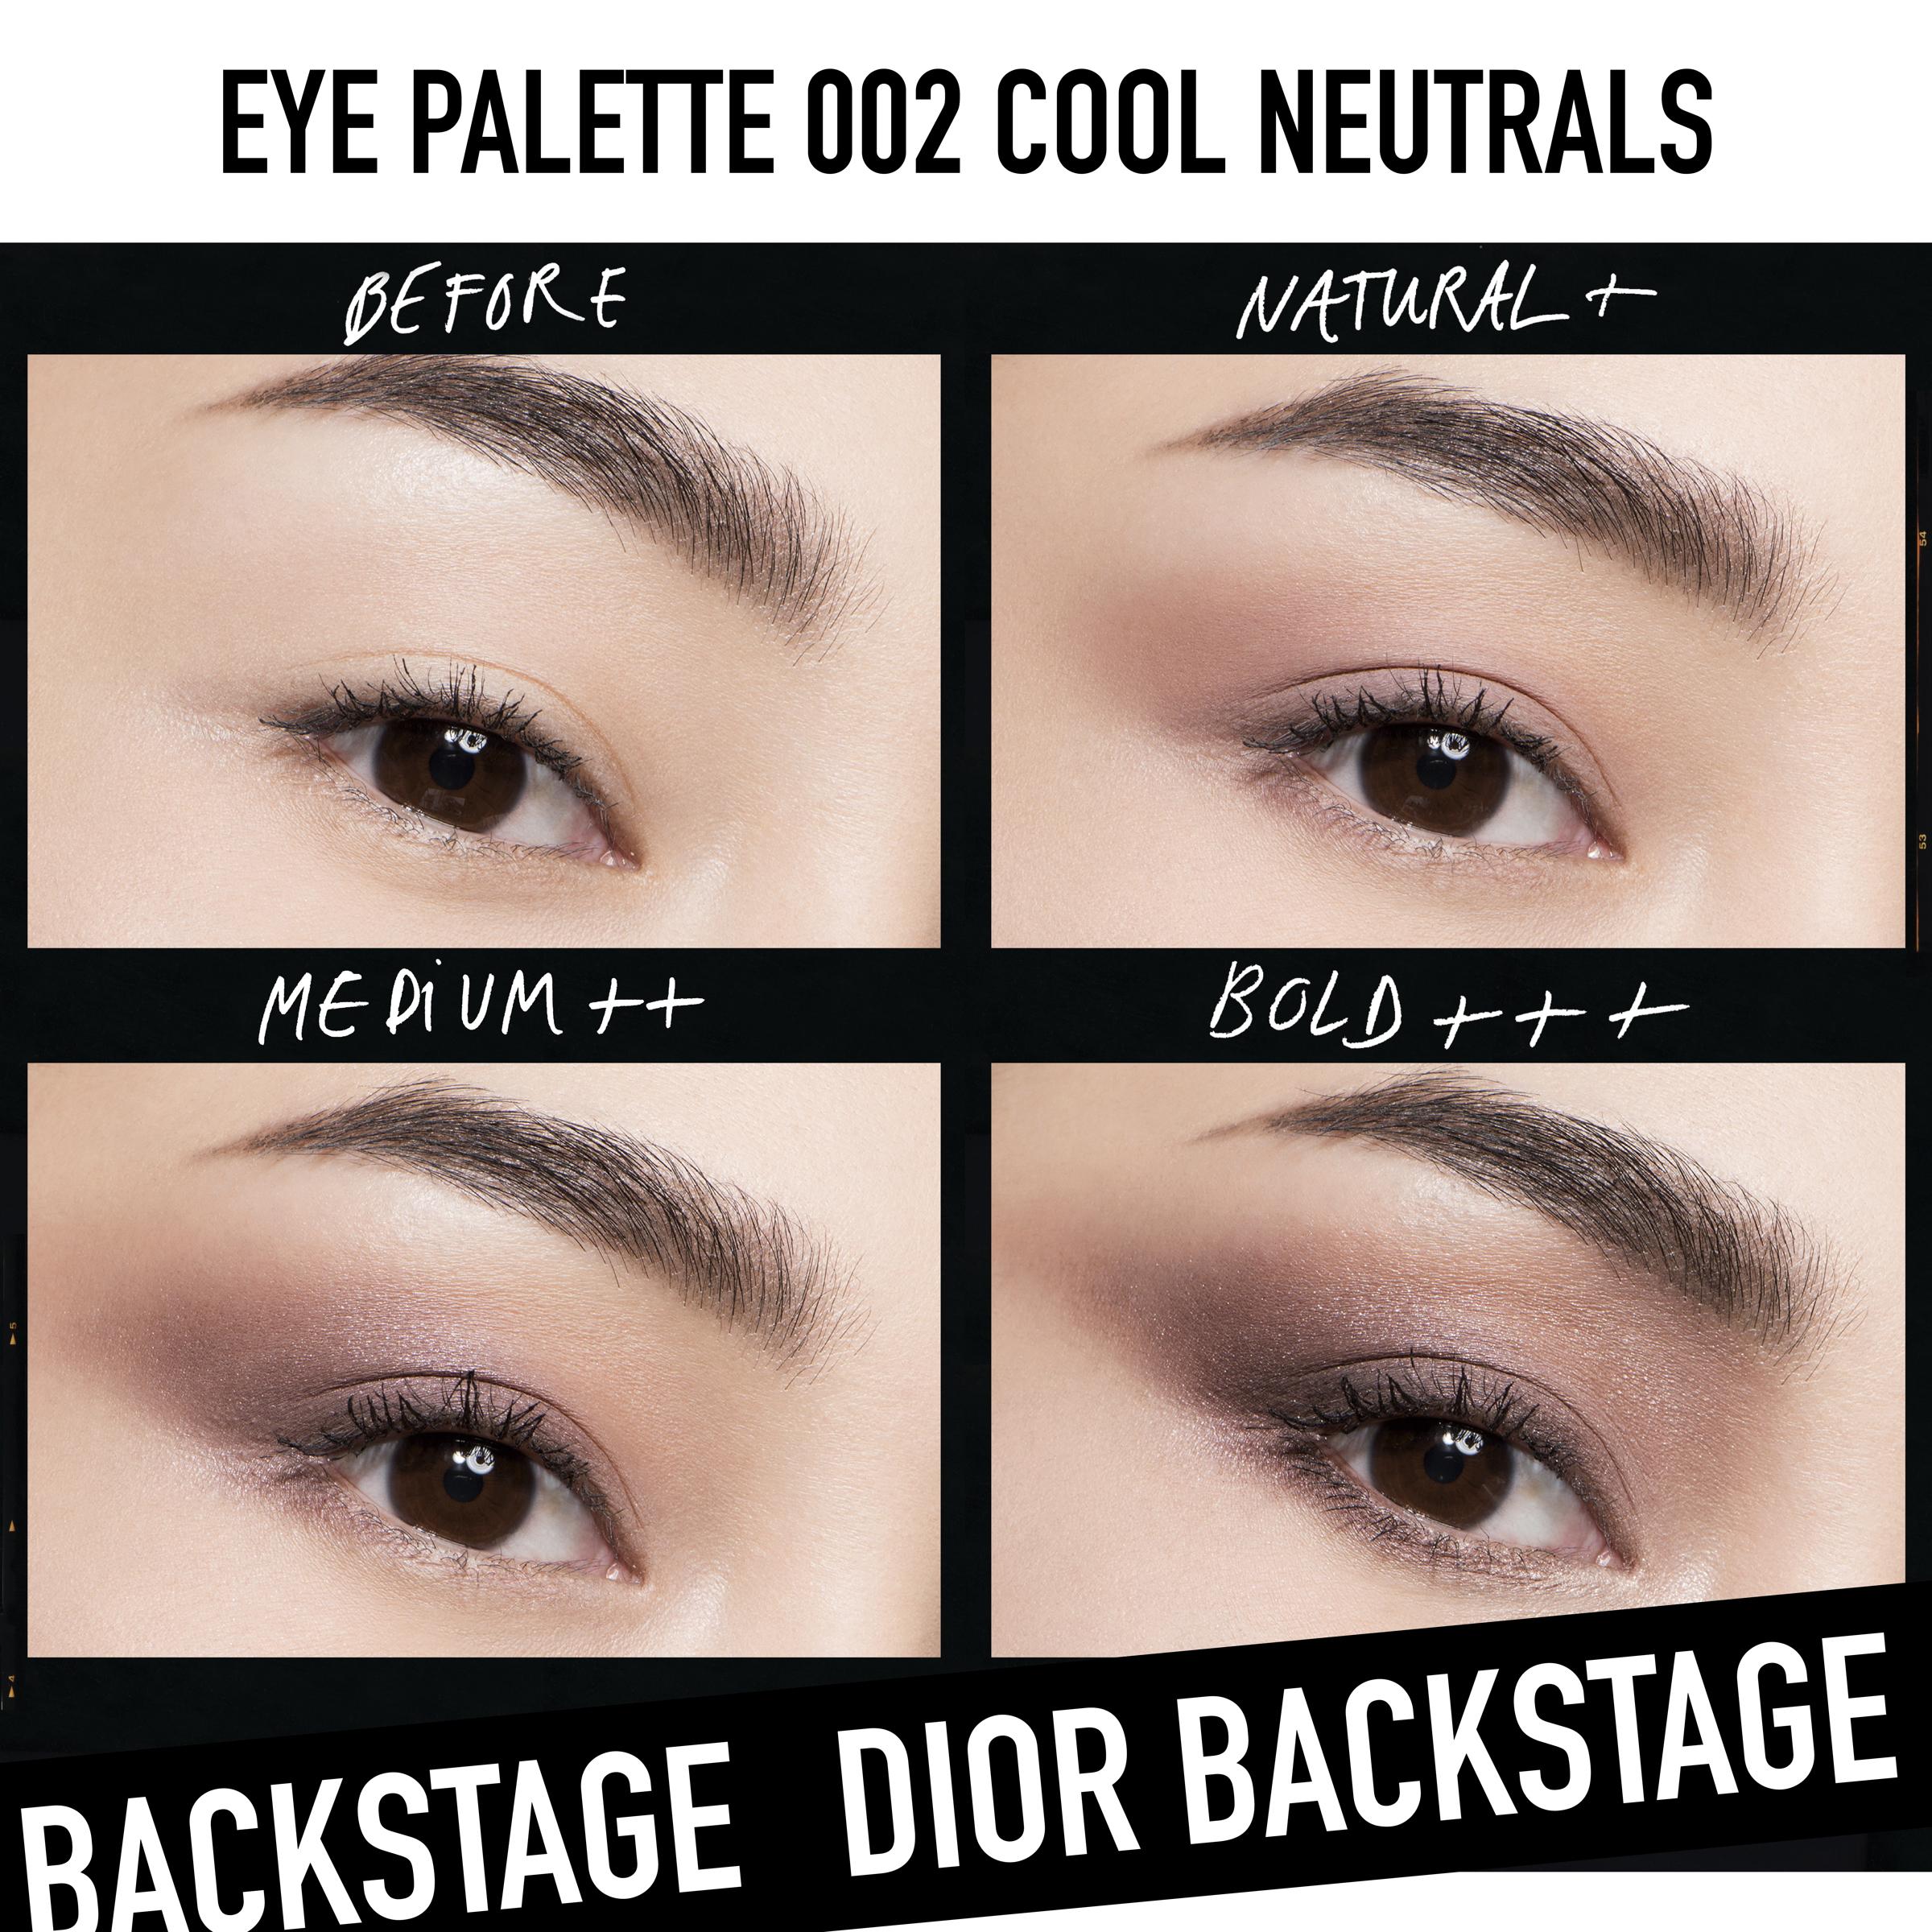 Backstage Eye Palette 002Cool